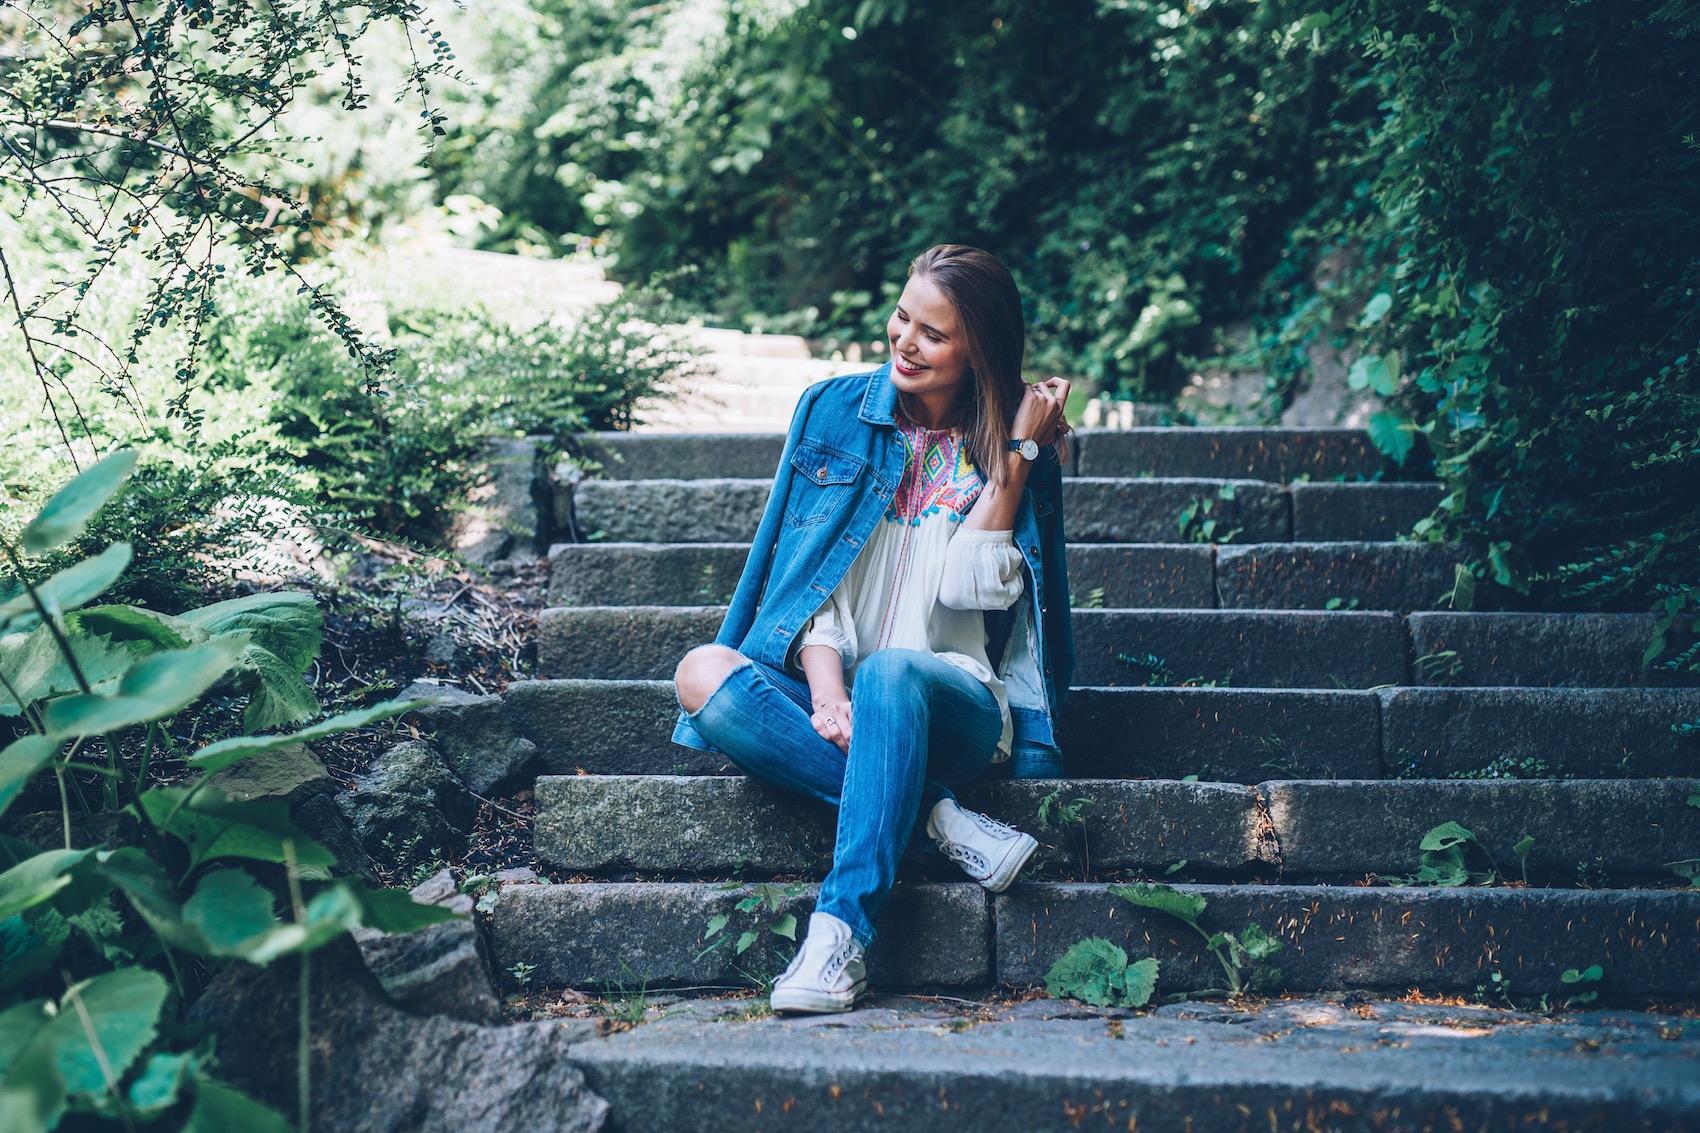 suelovesnyc_susan_fengler_blog_blogger_online_editor_dennis_kayser_jeansjacke_outfit_Hamburg_folklore_bluse_2